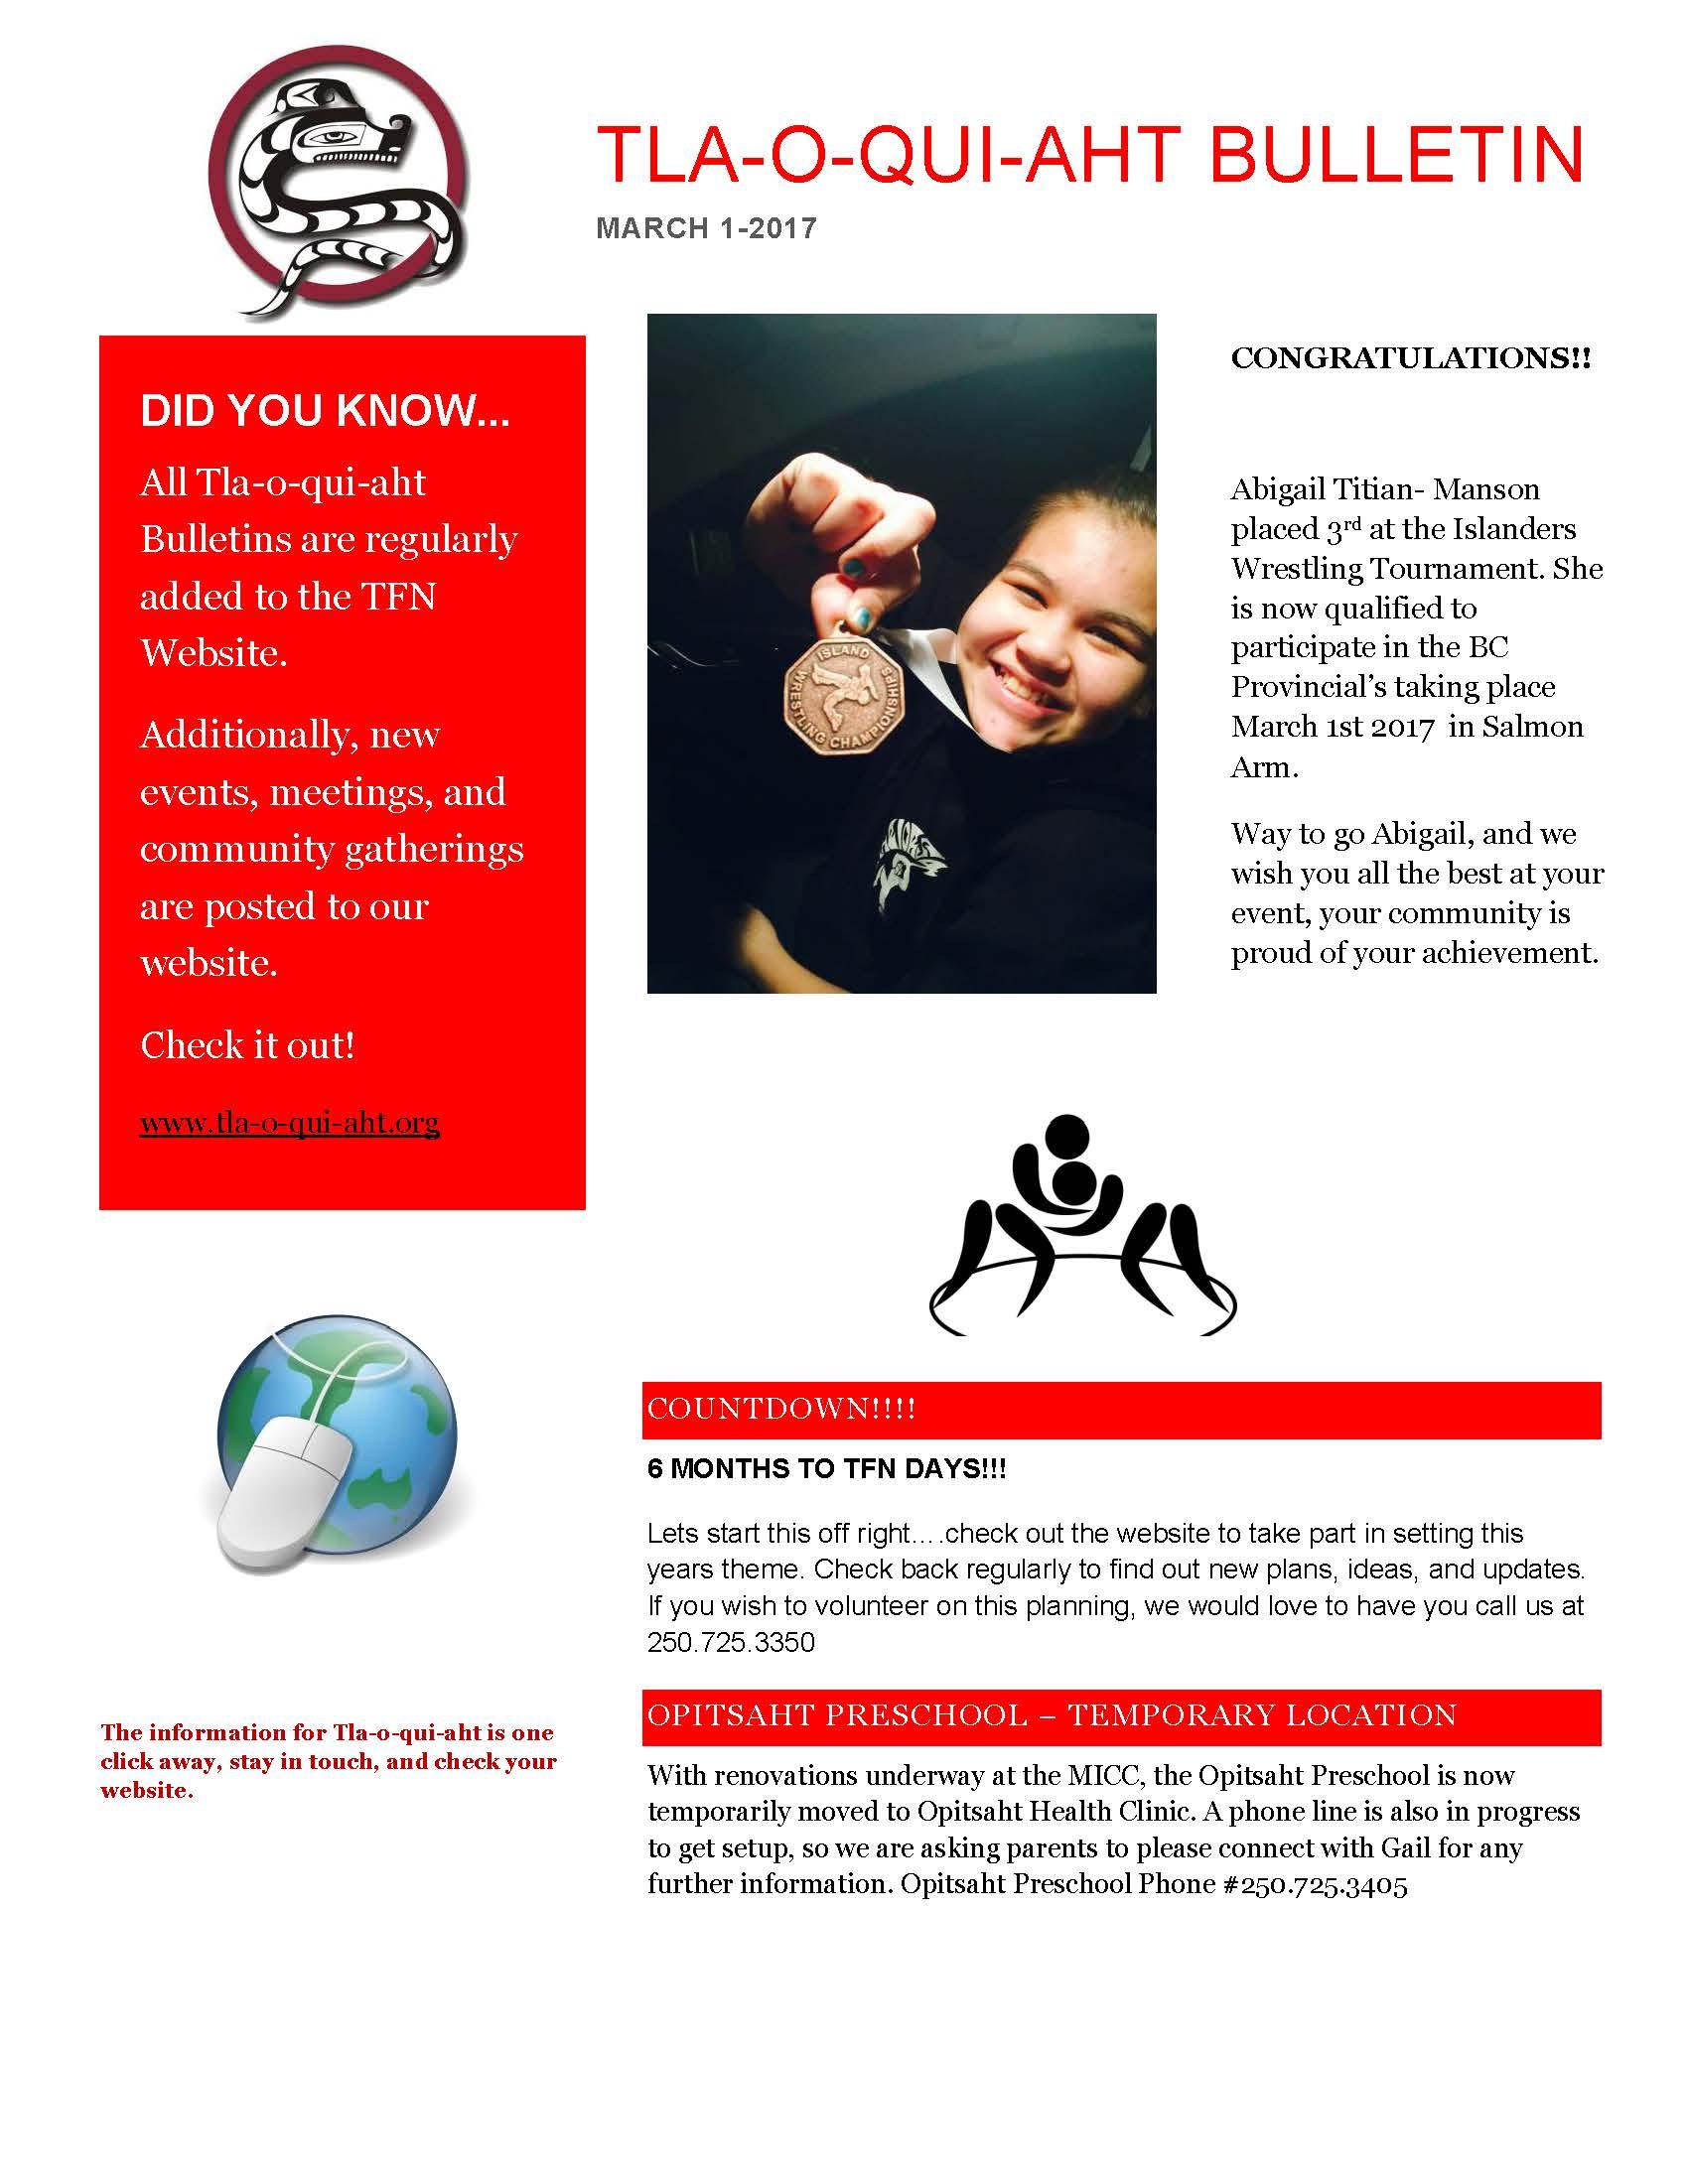 TFN Bulletin March 1 2017_Page_01.jpg